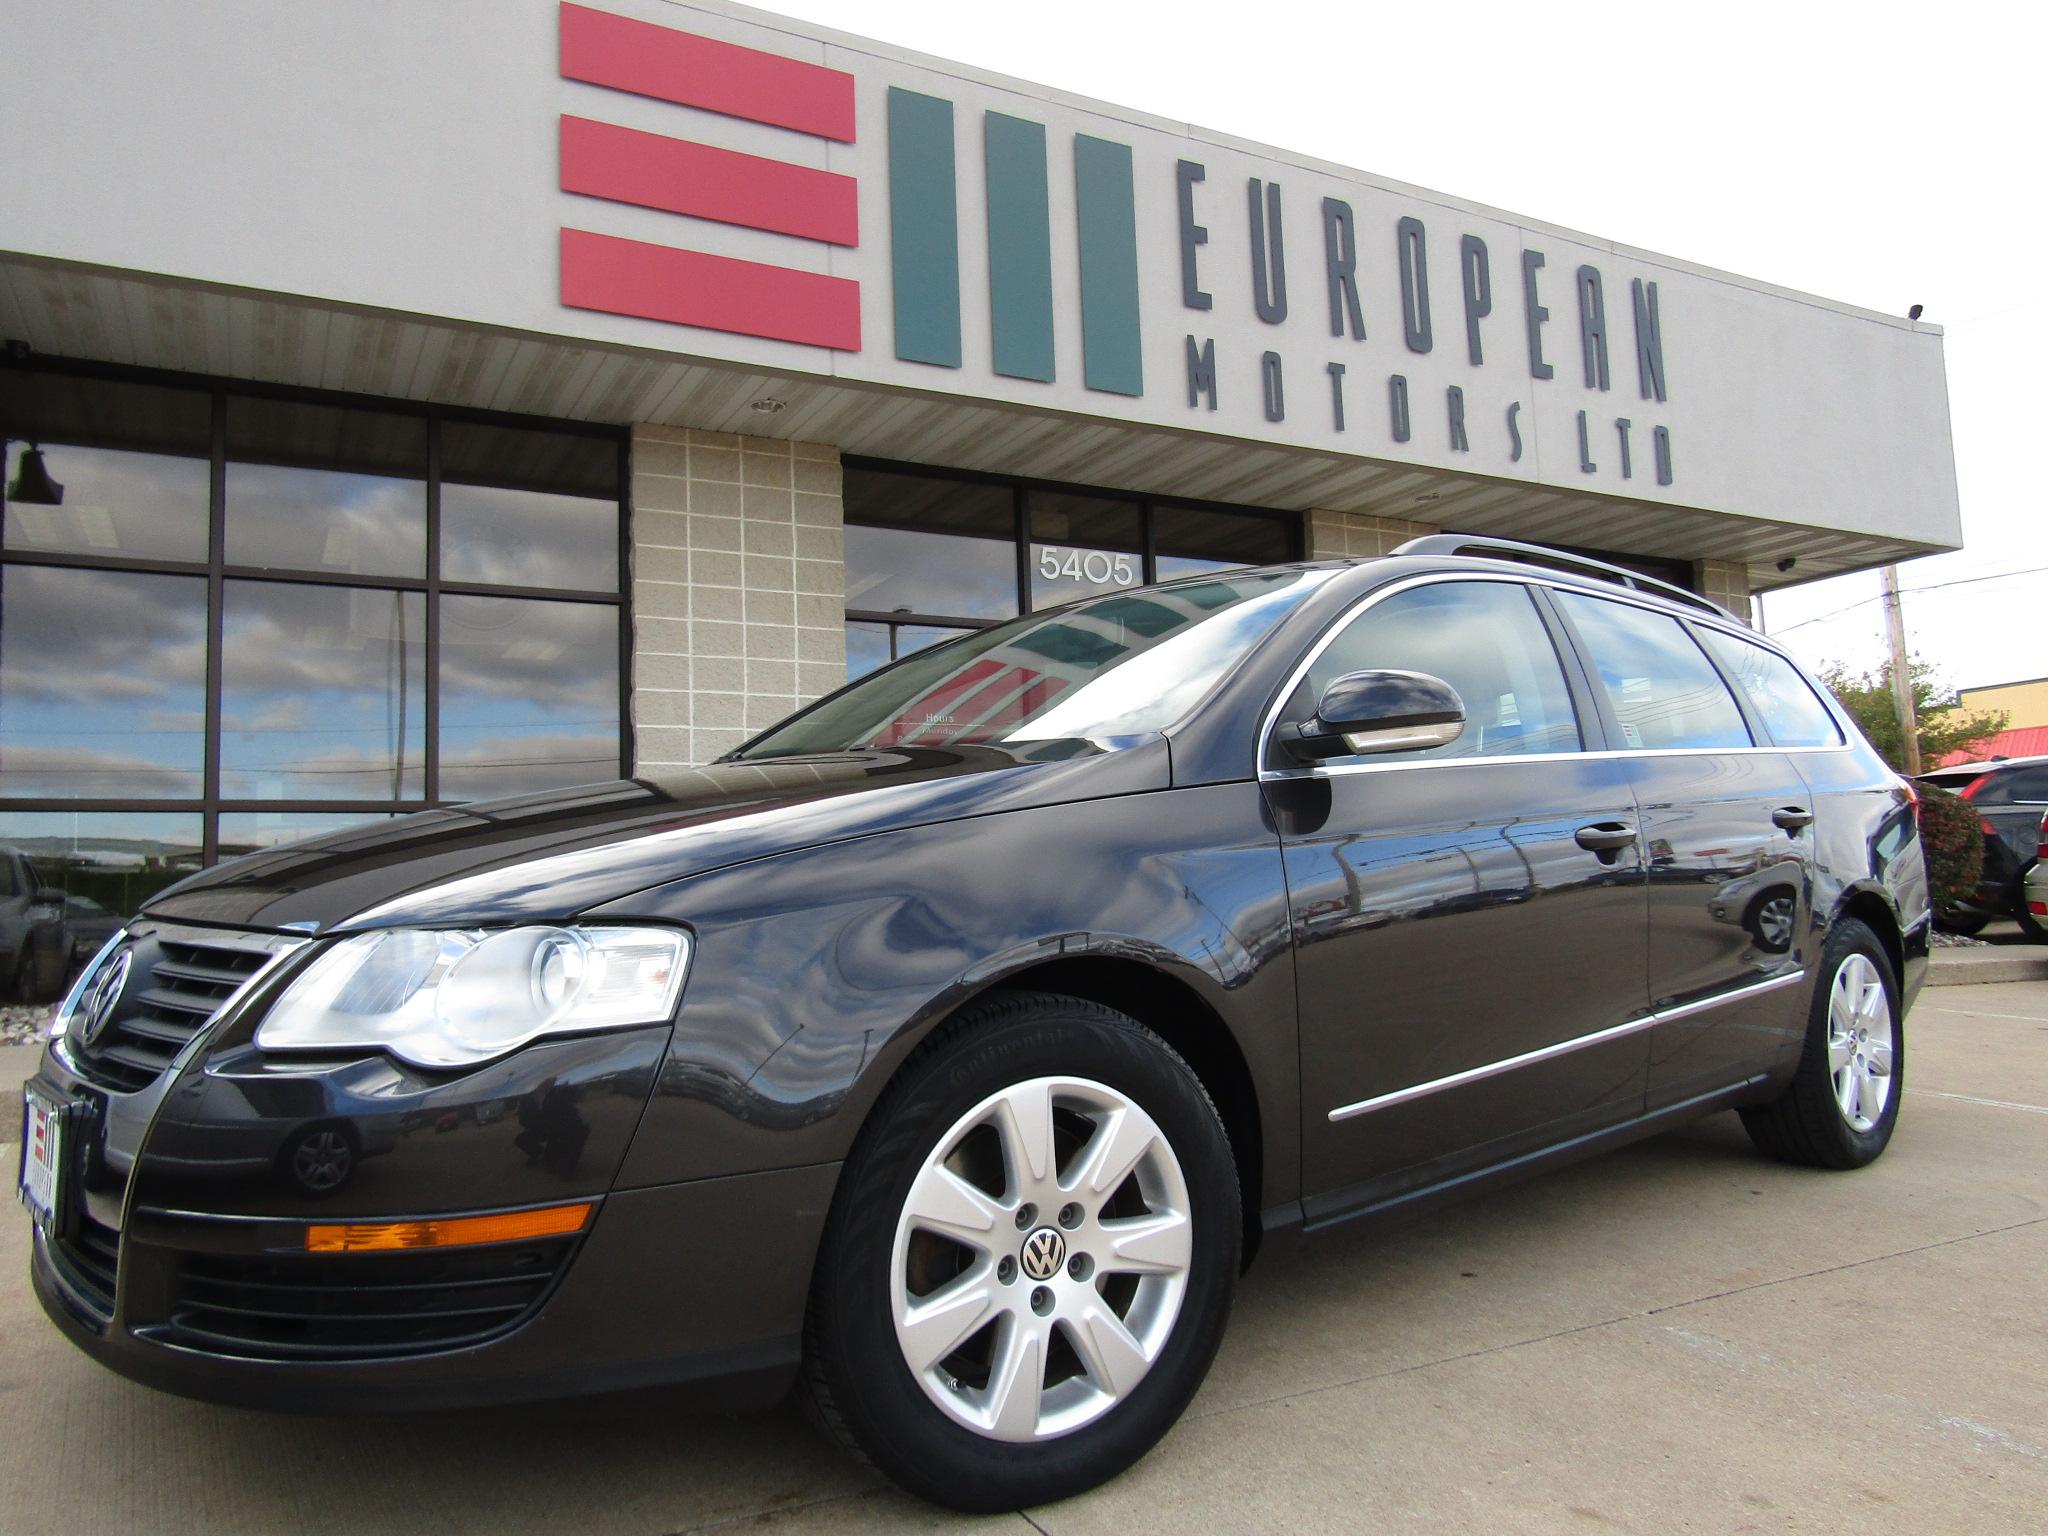 Great European Motors LTD | Cedar Rapids, IA Premier European Car Dealer